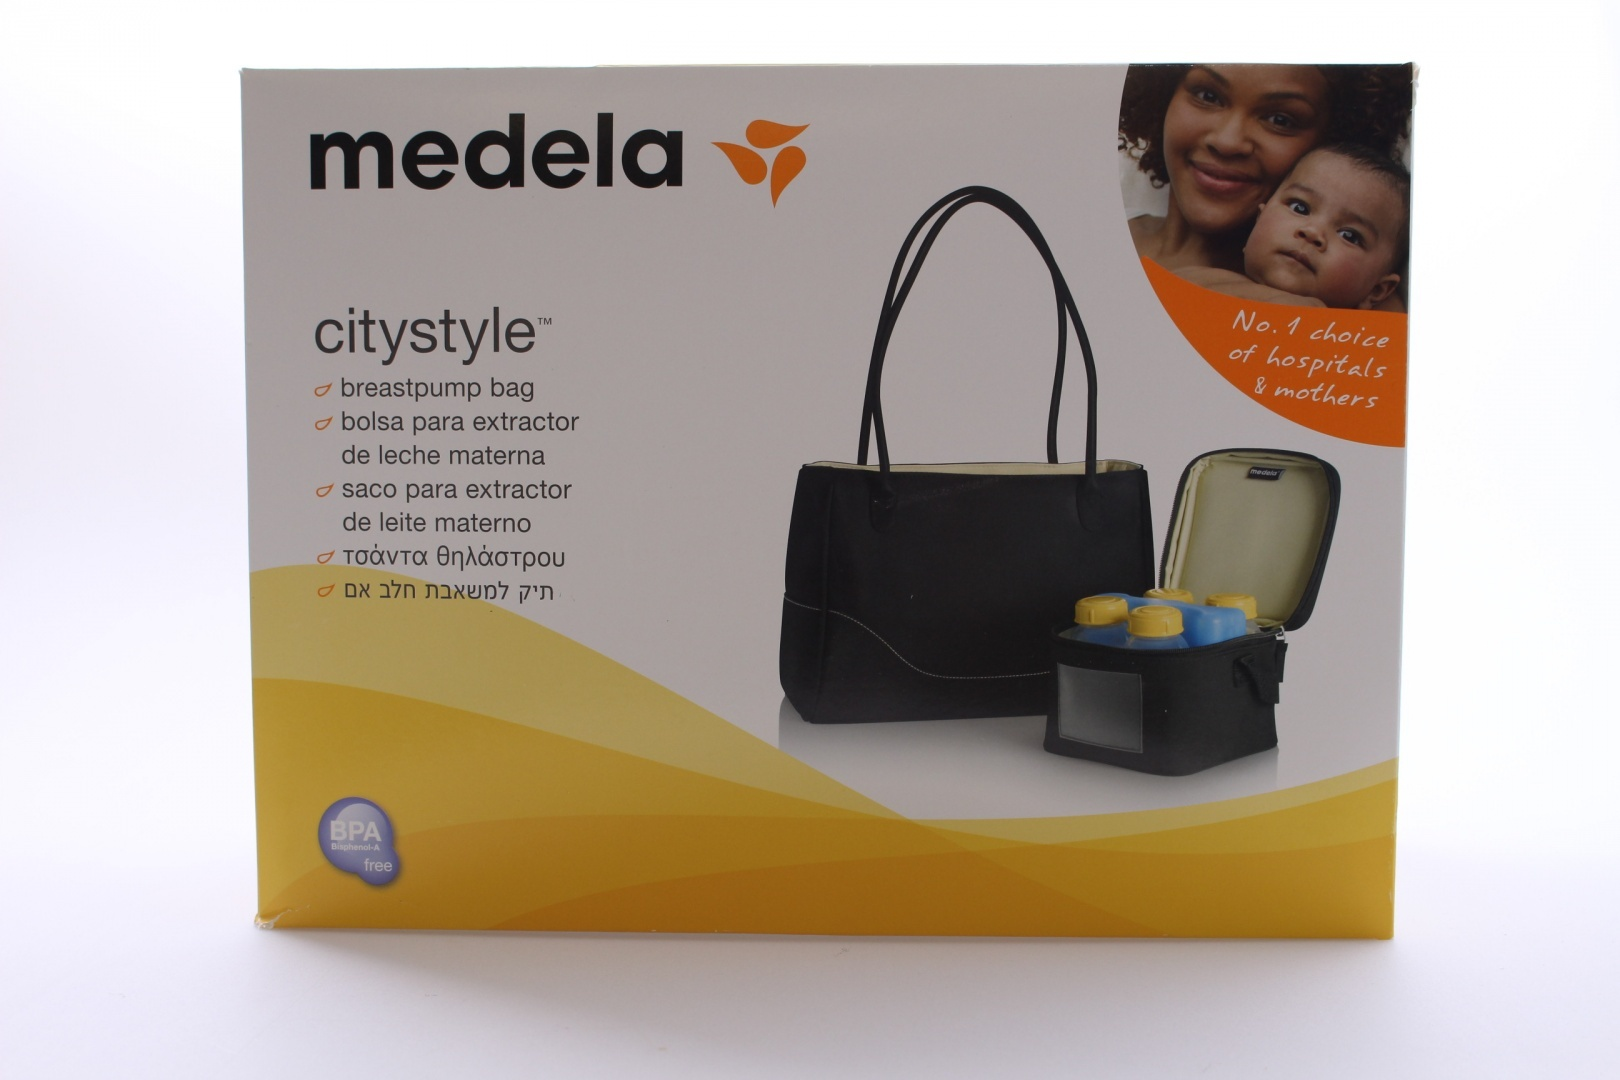 Medela Citystyle Breastpump Bag By Medela Shop Online For Baby In New Zealand